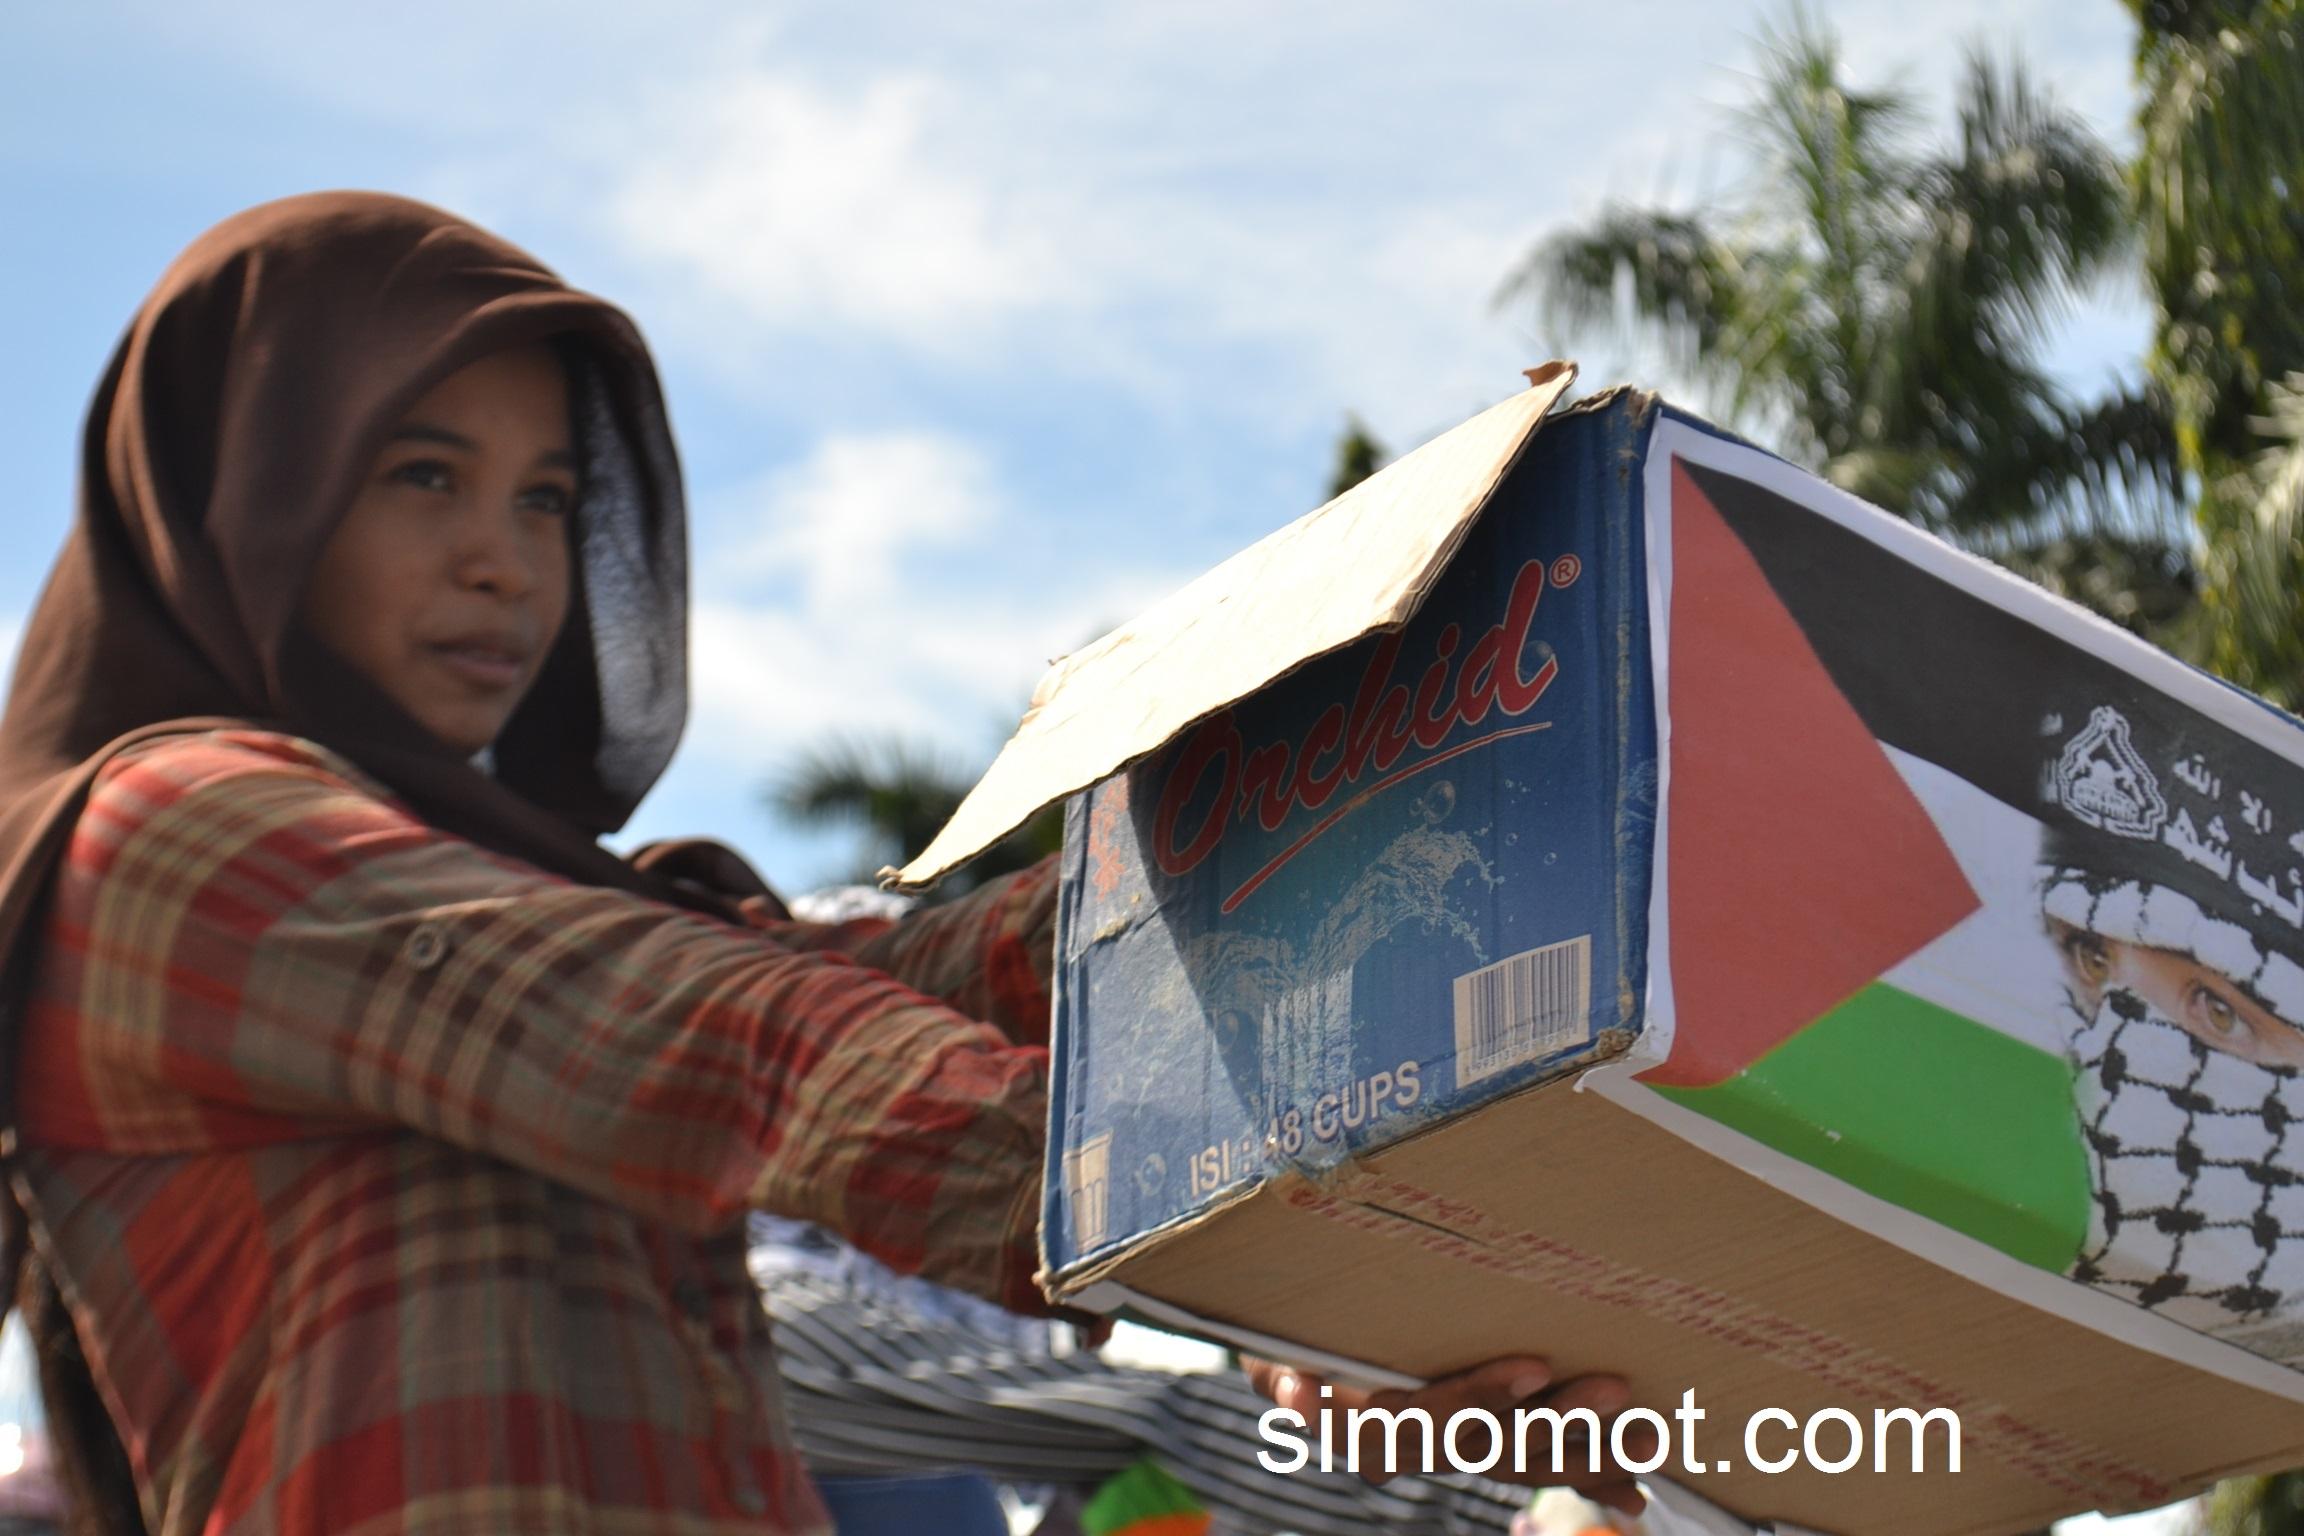 Warga Perbatasan Indonesia Malaysia Menggalang Dana Bantuan Korban Penyerangan Israel